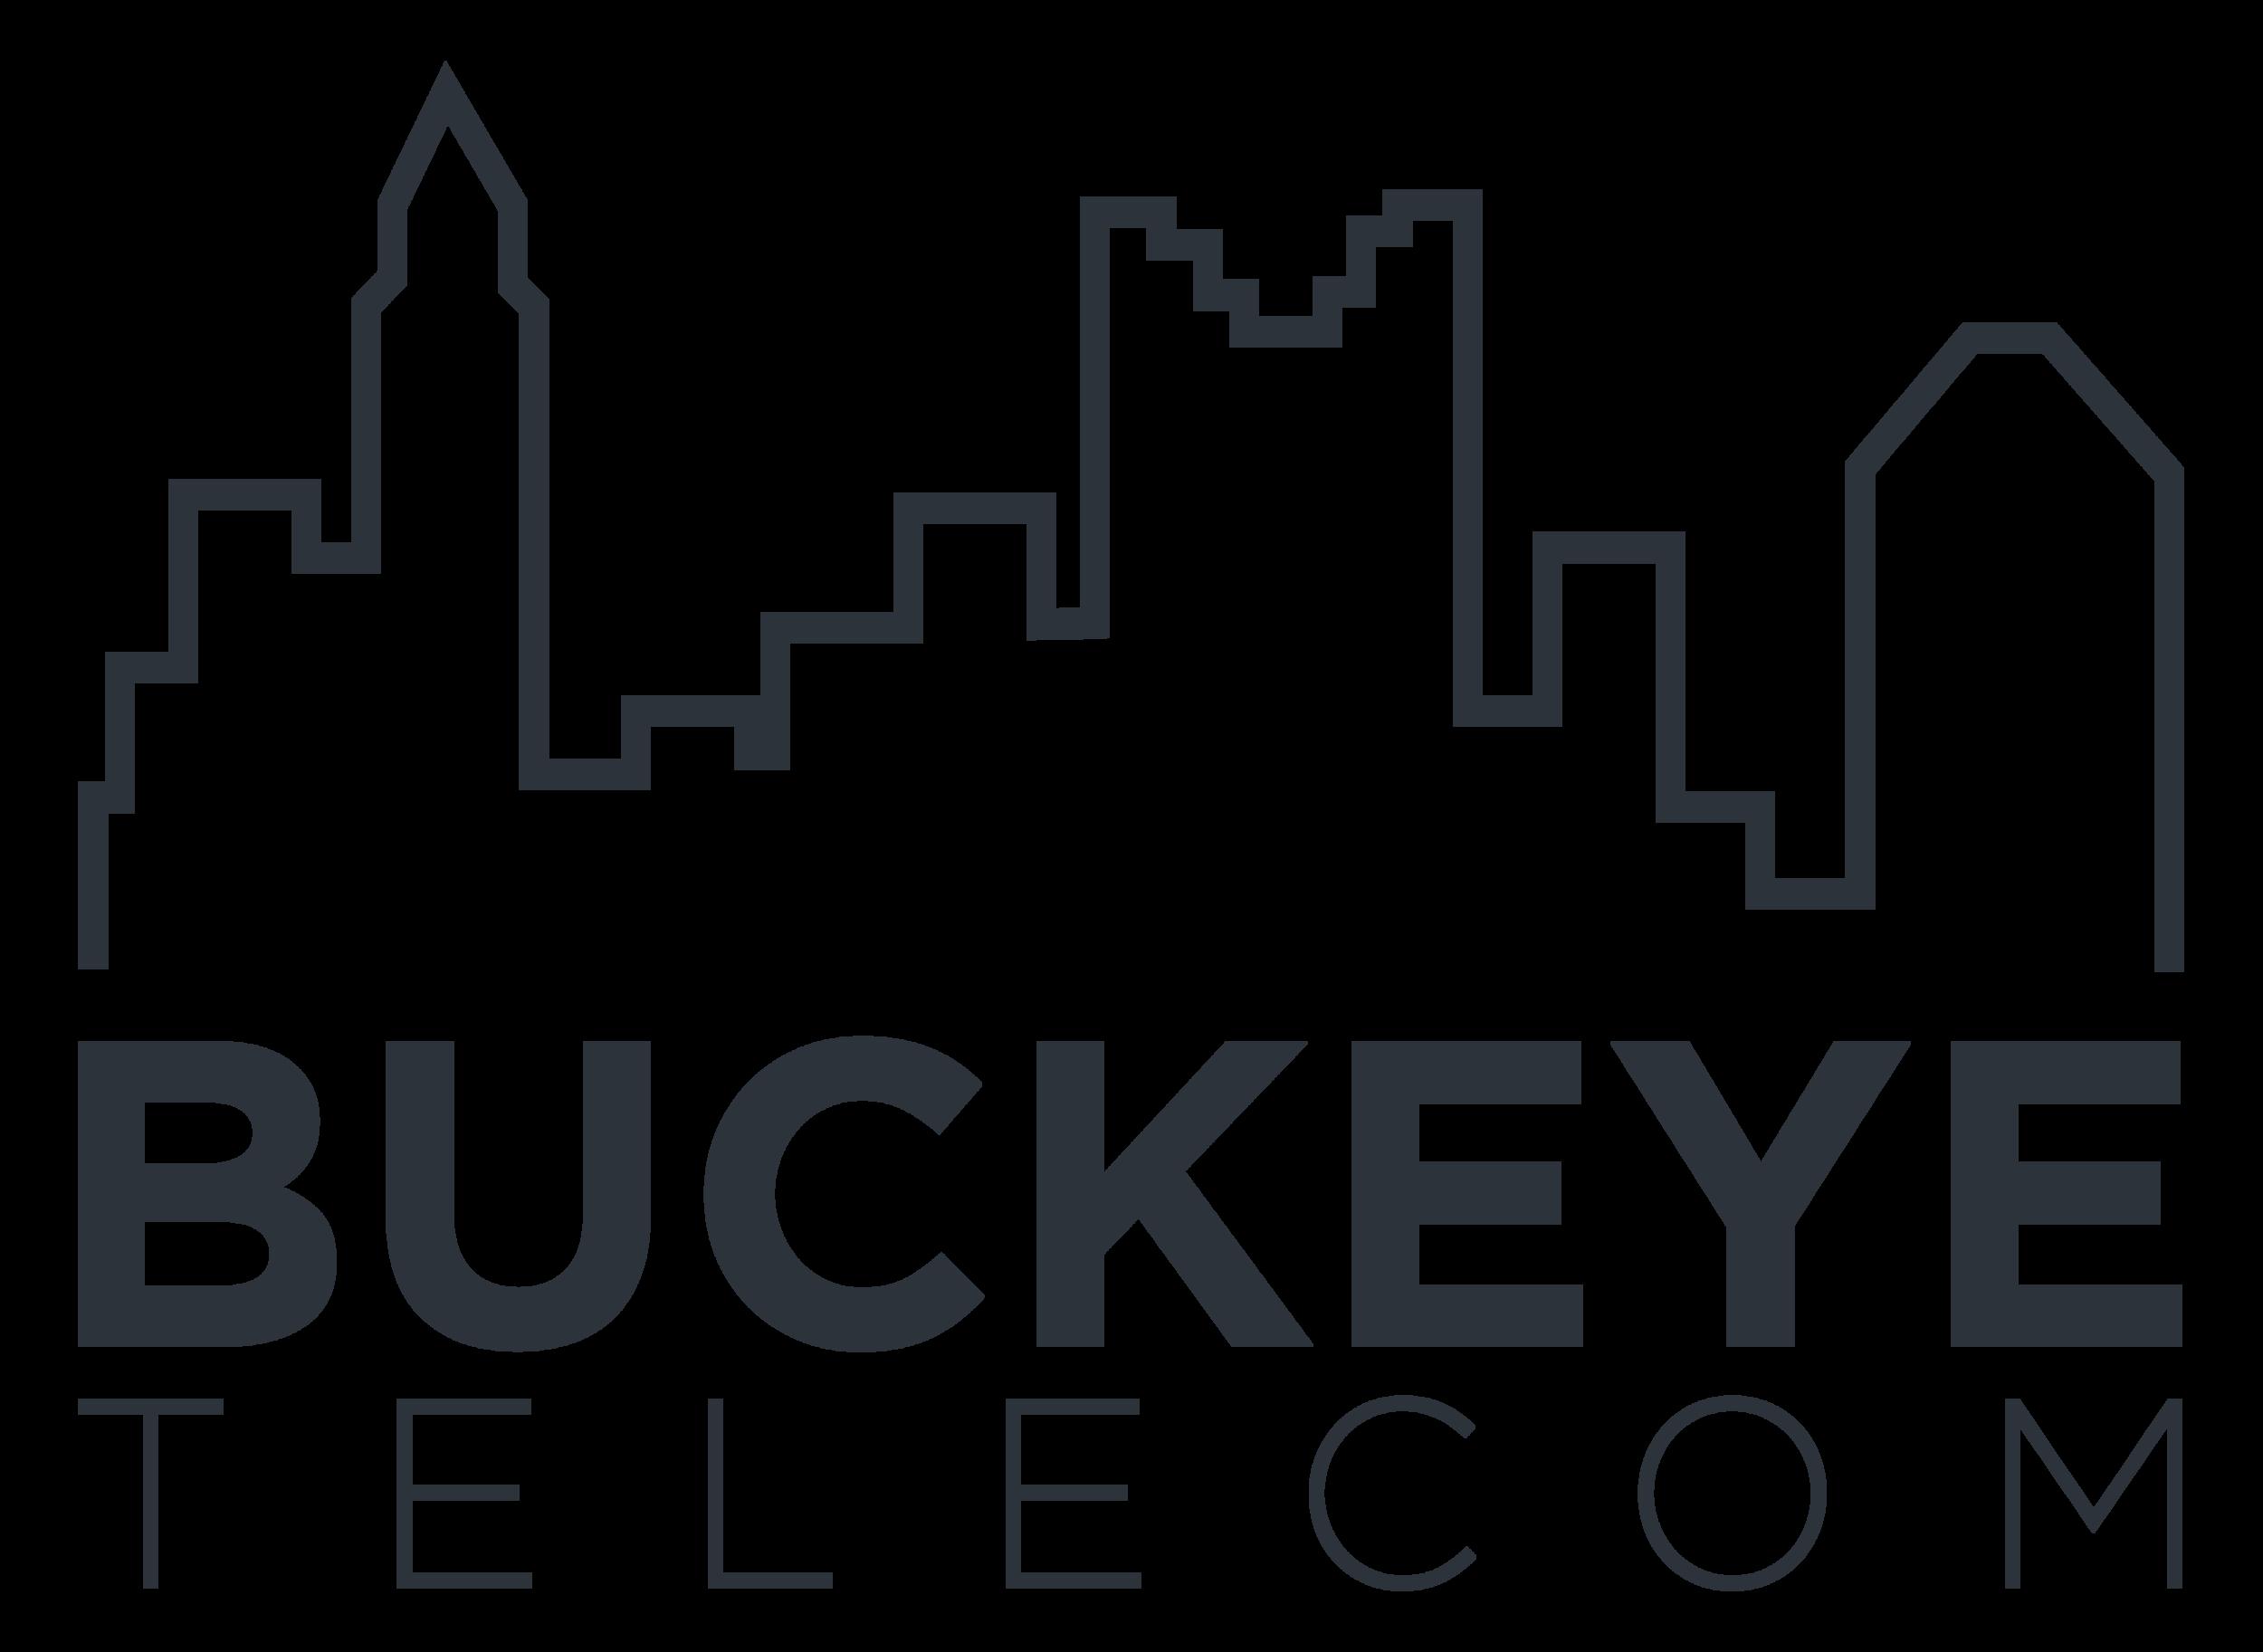 Buckeye Telecom-01.png